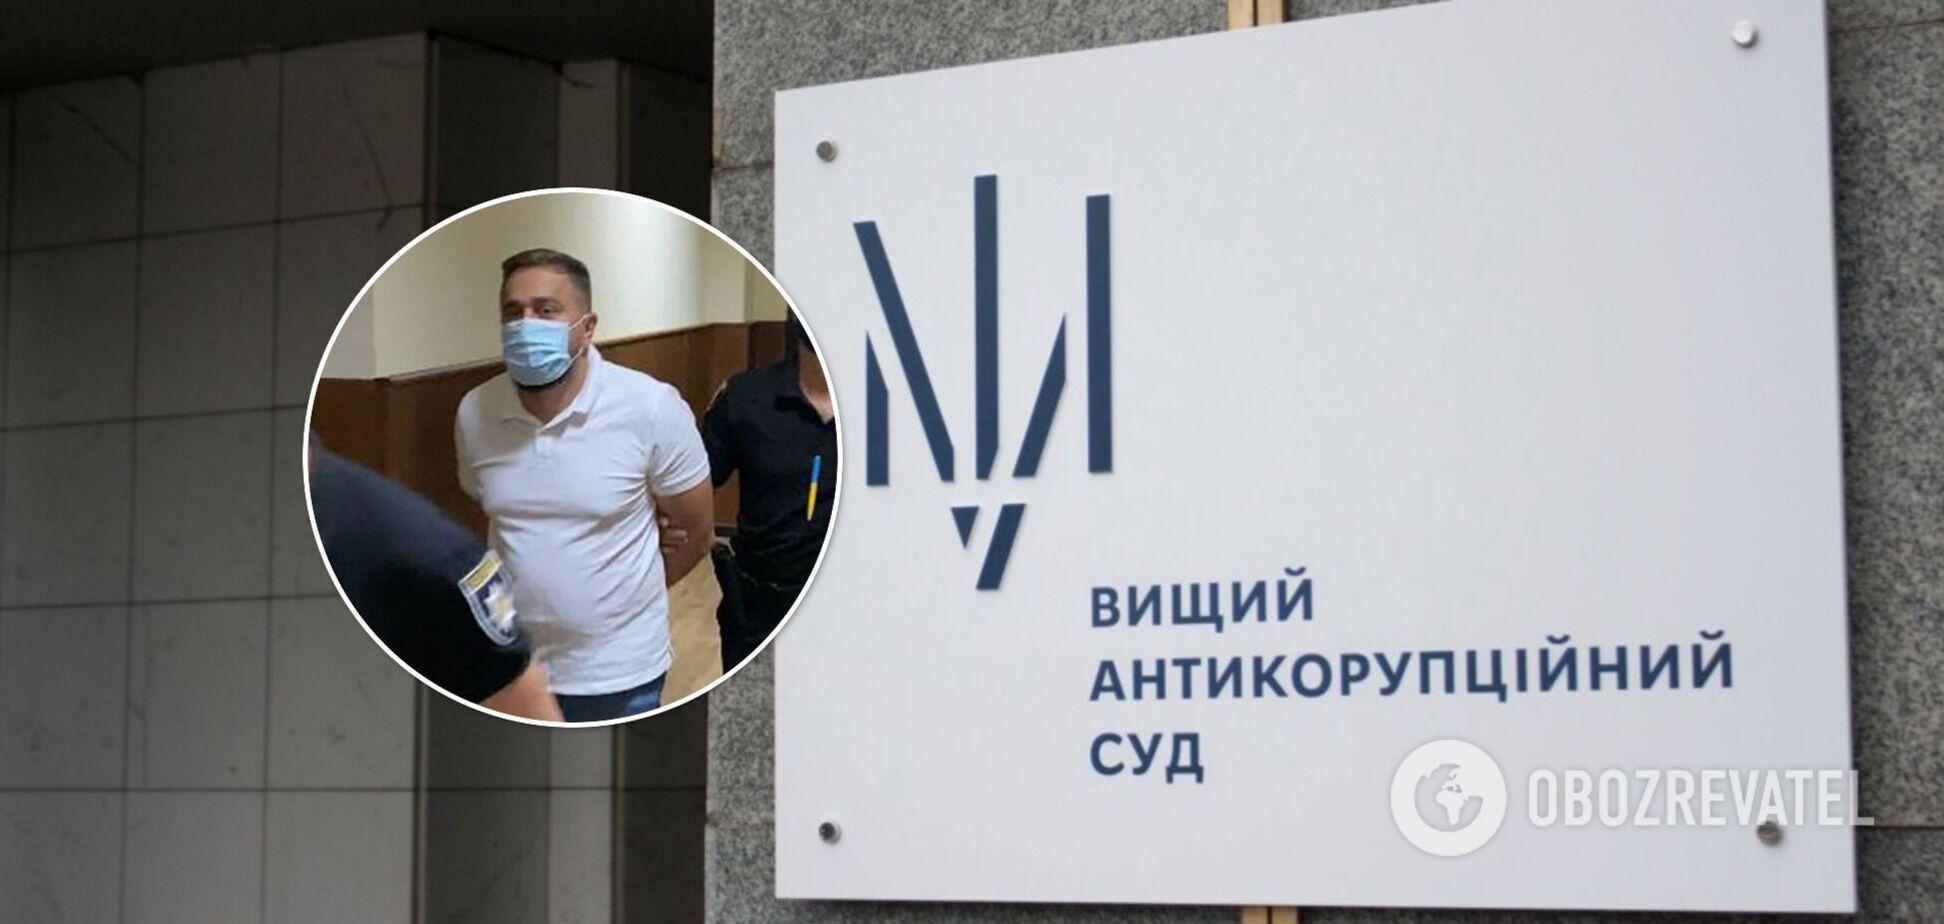 Сергея Коренева отпустили домой